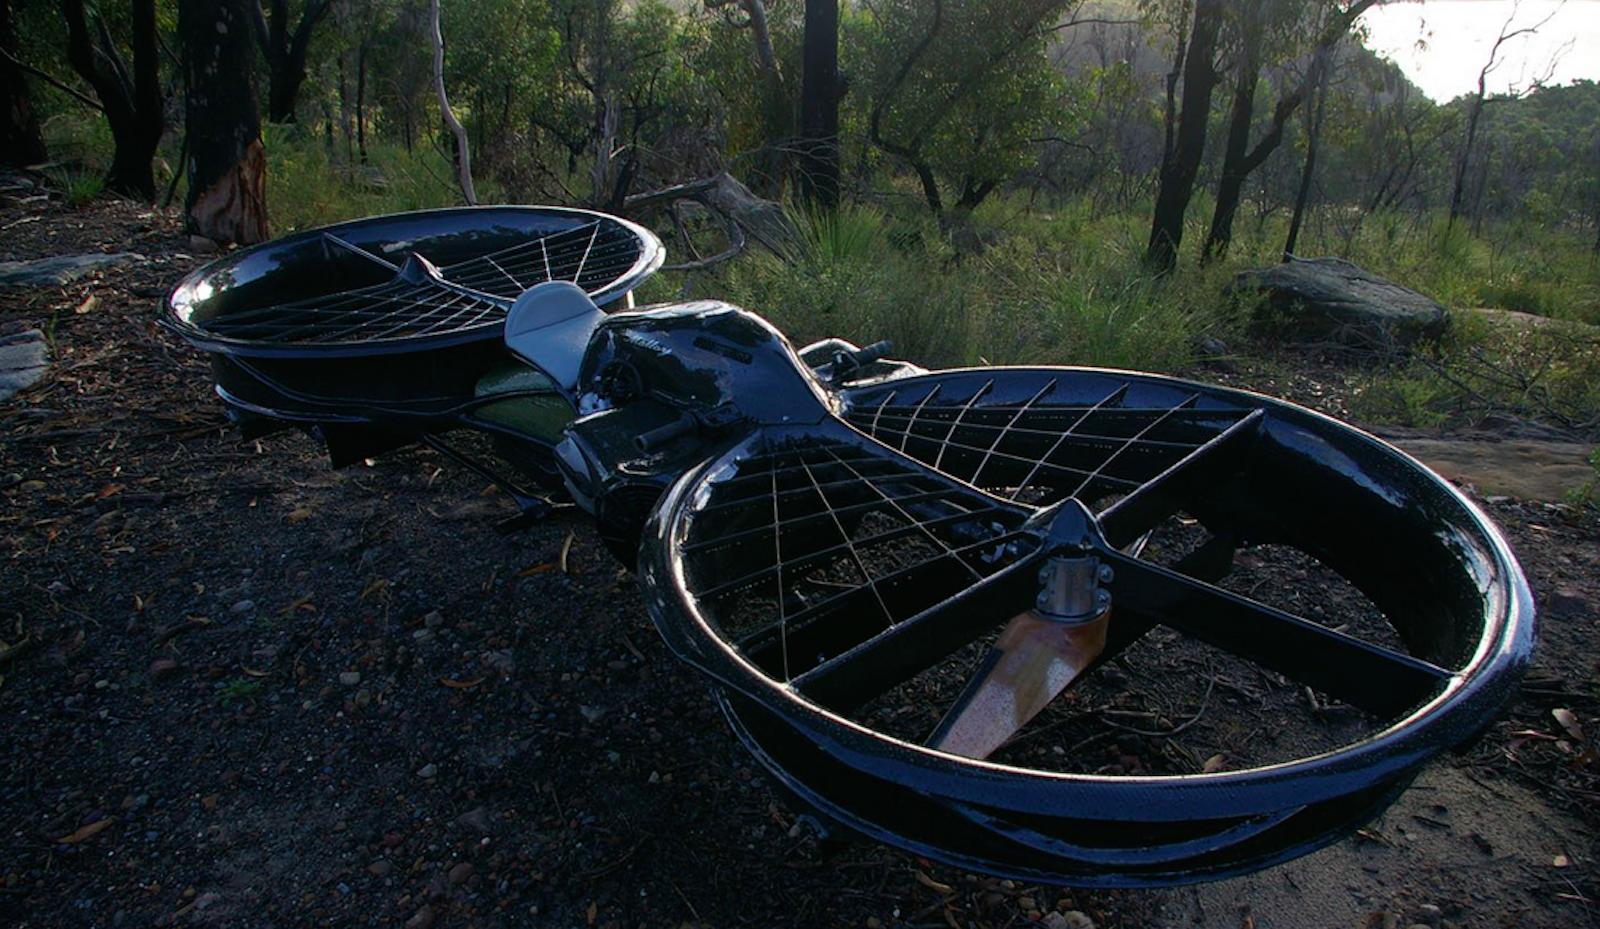 The new hoverbike developed by Malloy Aeronautics